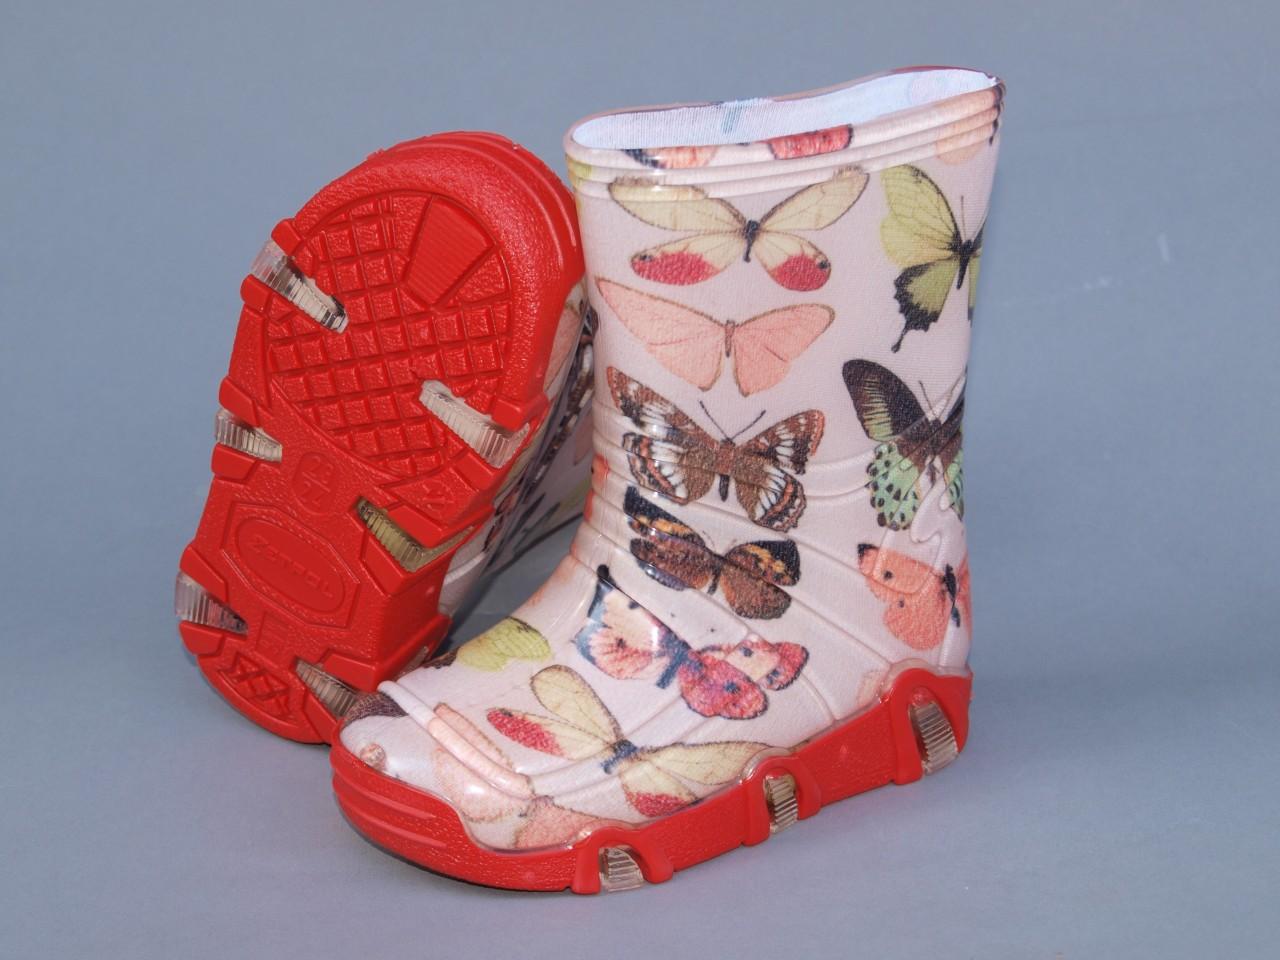 Szuwarek dievčenské gumové čižmy s motýľmi